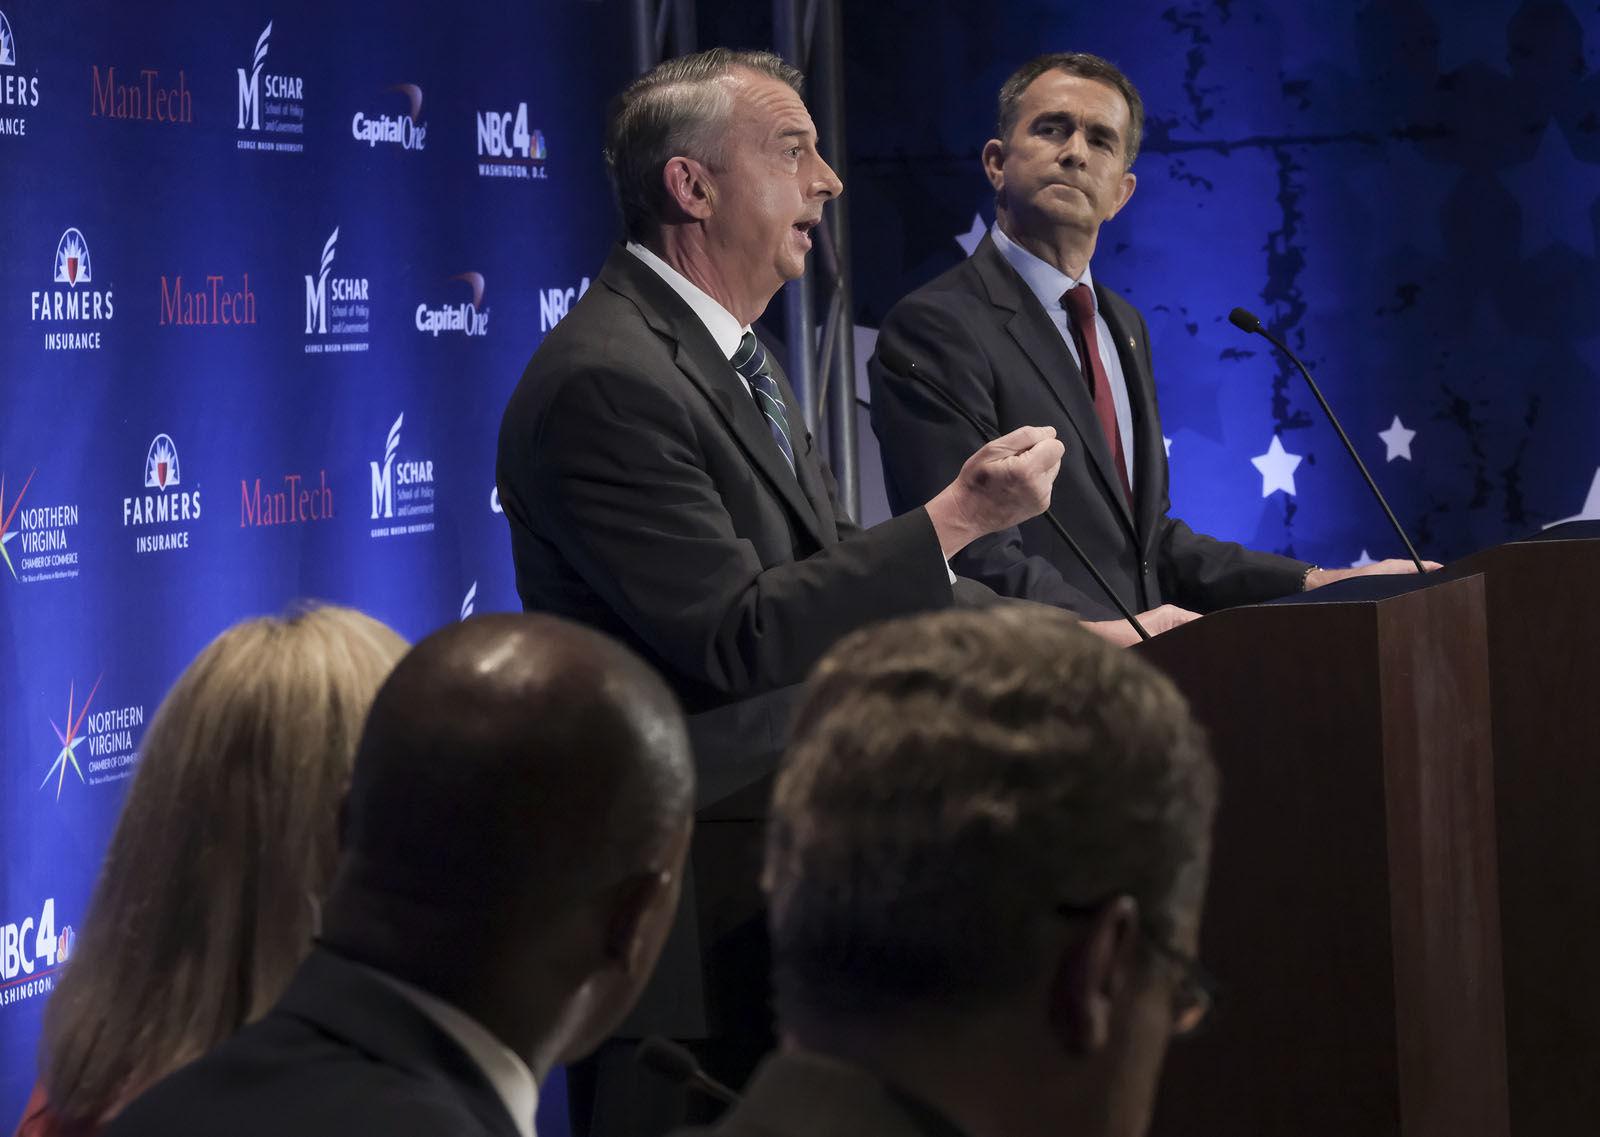 WASHINGTON , DC - SEPTEMBER 19: Gubernatorial debate between Ed Gillespie and Lt. Gov. Ralph Northam in Washington , DC on September 19, 2017. (Pool Photo by Bonnie Jo Mount/The Washington Post)